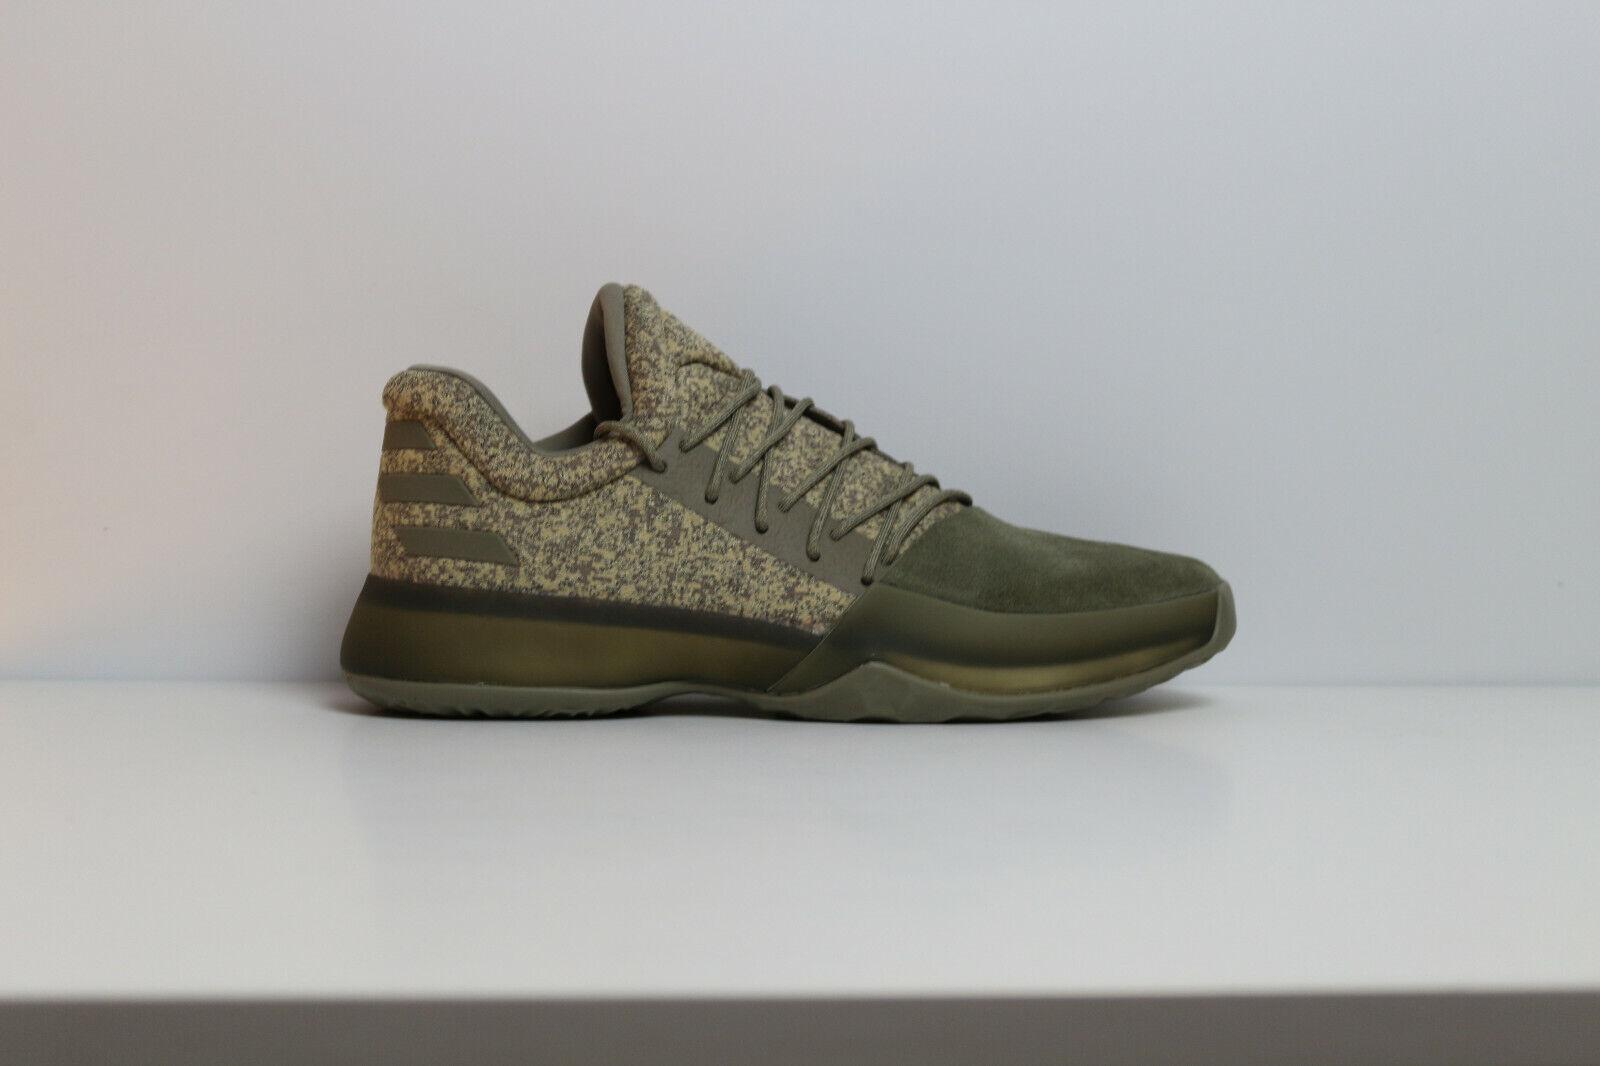 Adidas Harden Vol.1 BW0550 Cargo Caqui verde Zapatos De Baloncesto Voleibol James